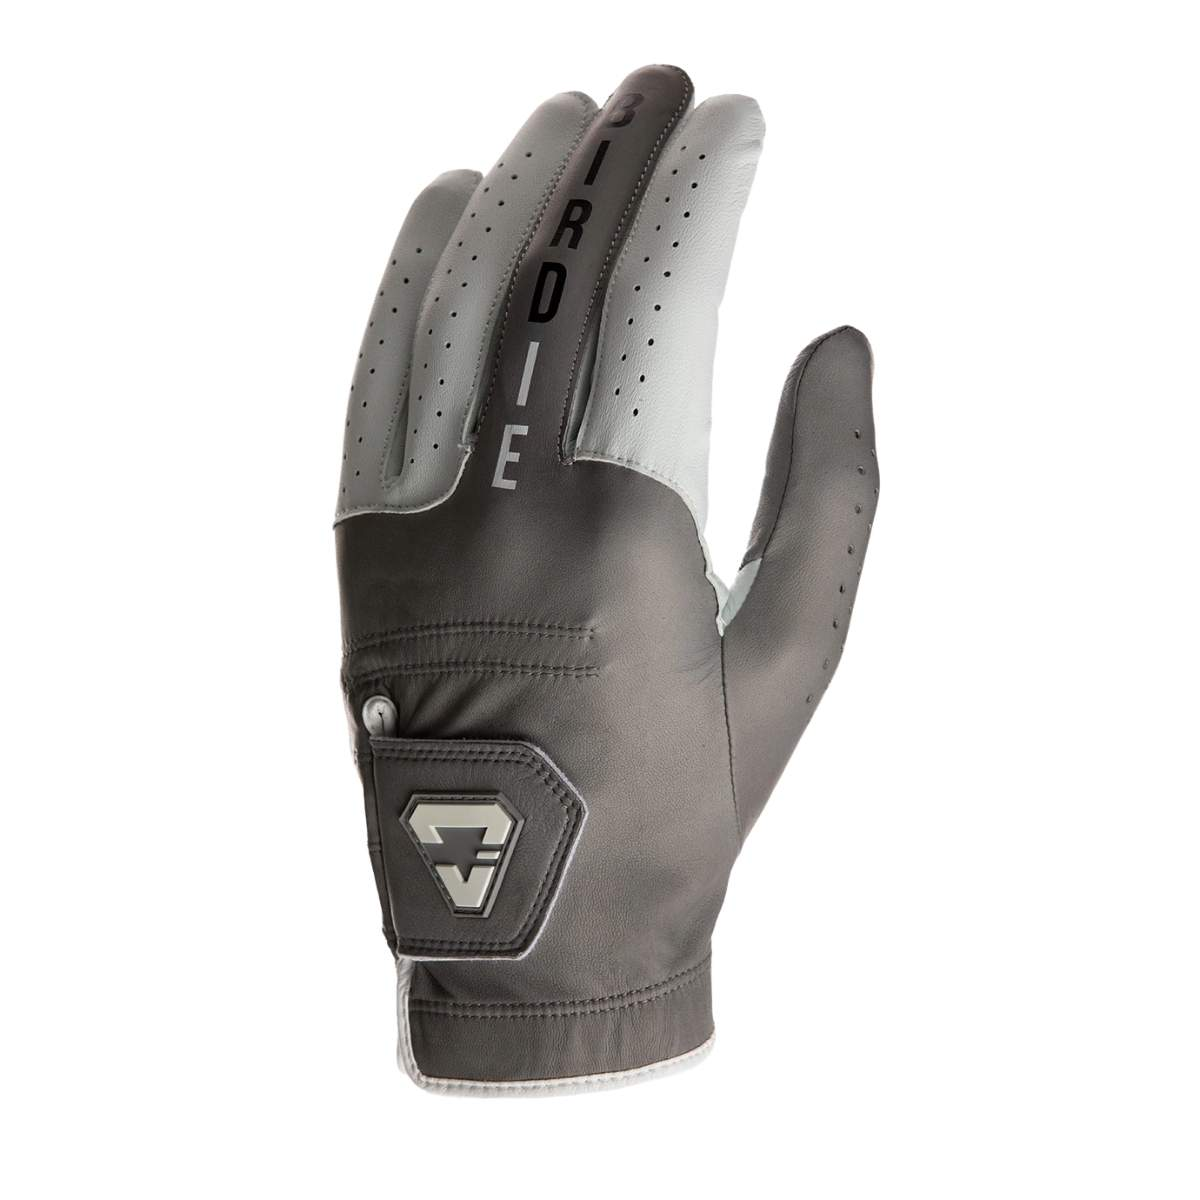 TravisMathew Between The Lines Golf Glove - Left Hand Cadet